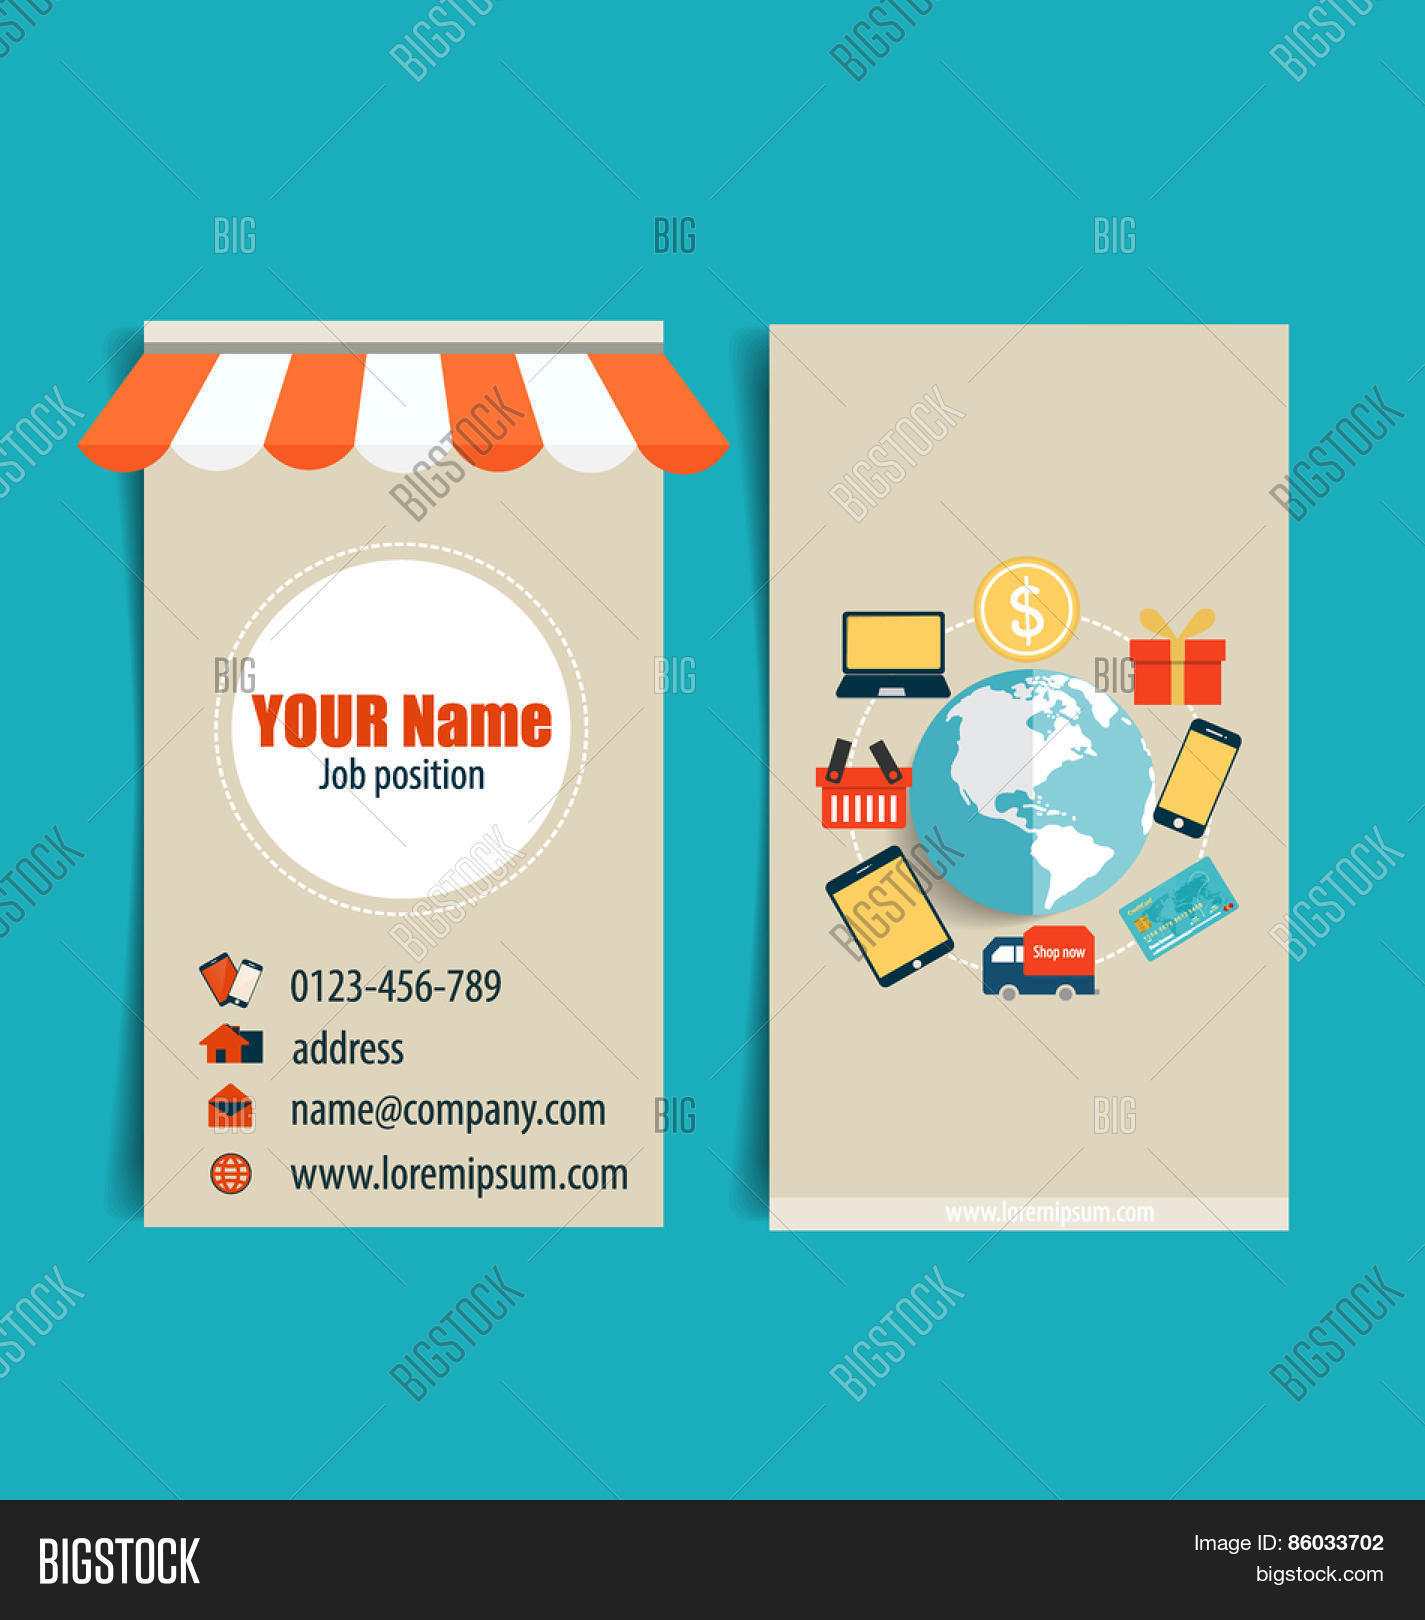 Magnificent Business Card Online Designer Pictures Inspiration ...